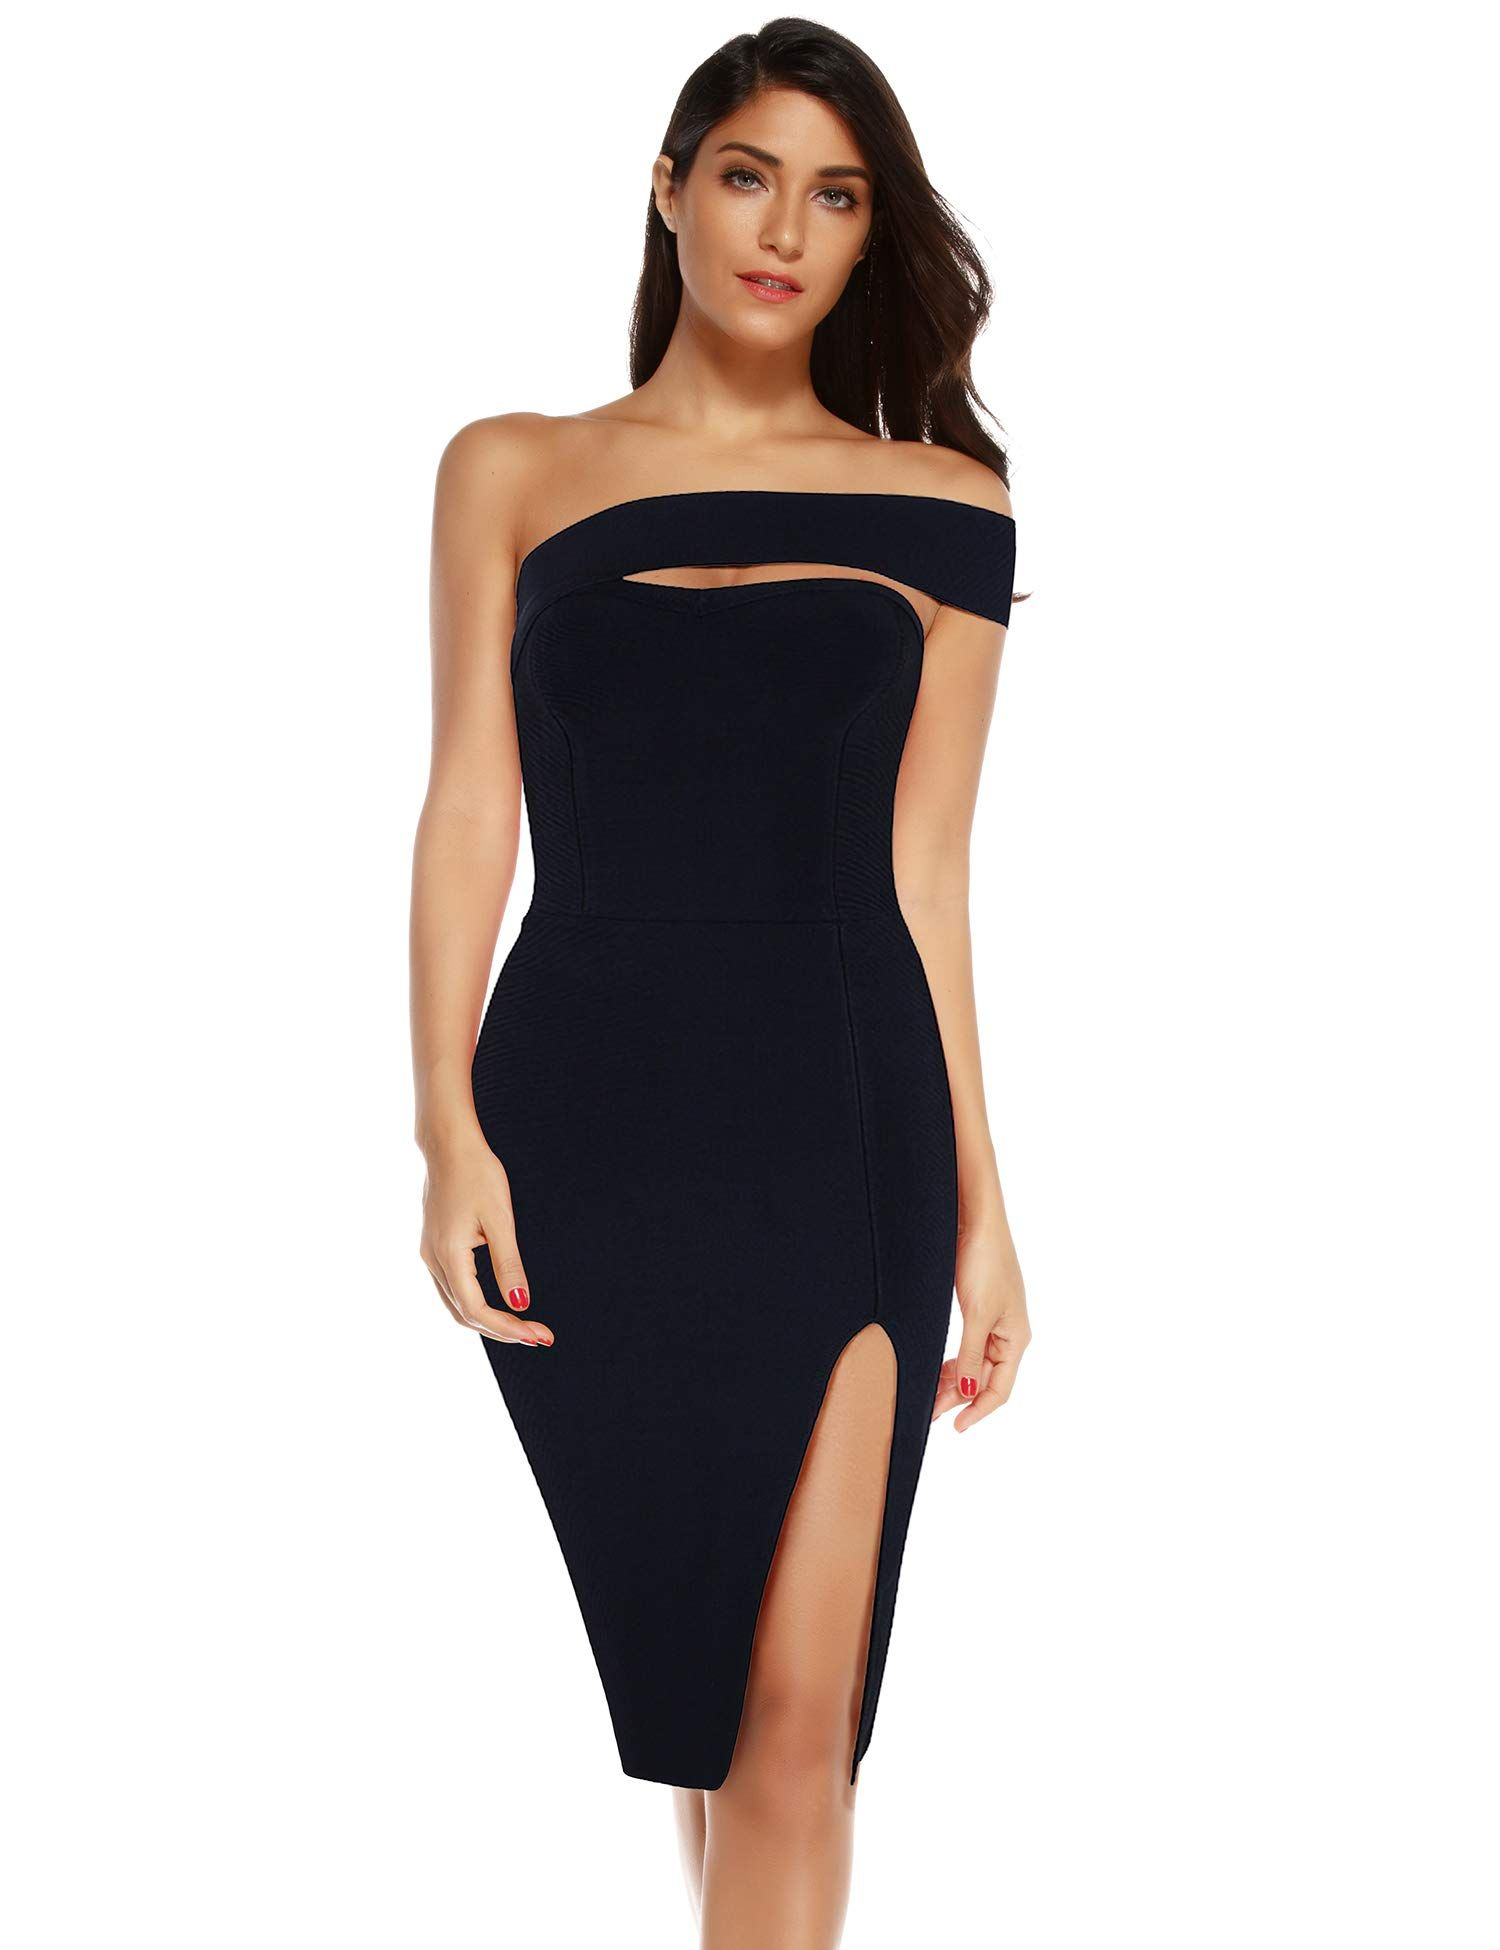 9fa015015d7bb Meilun Womens Bodycon Bandage Dress Vestidos One Shoulder Midi ...